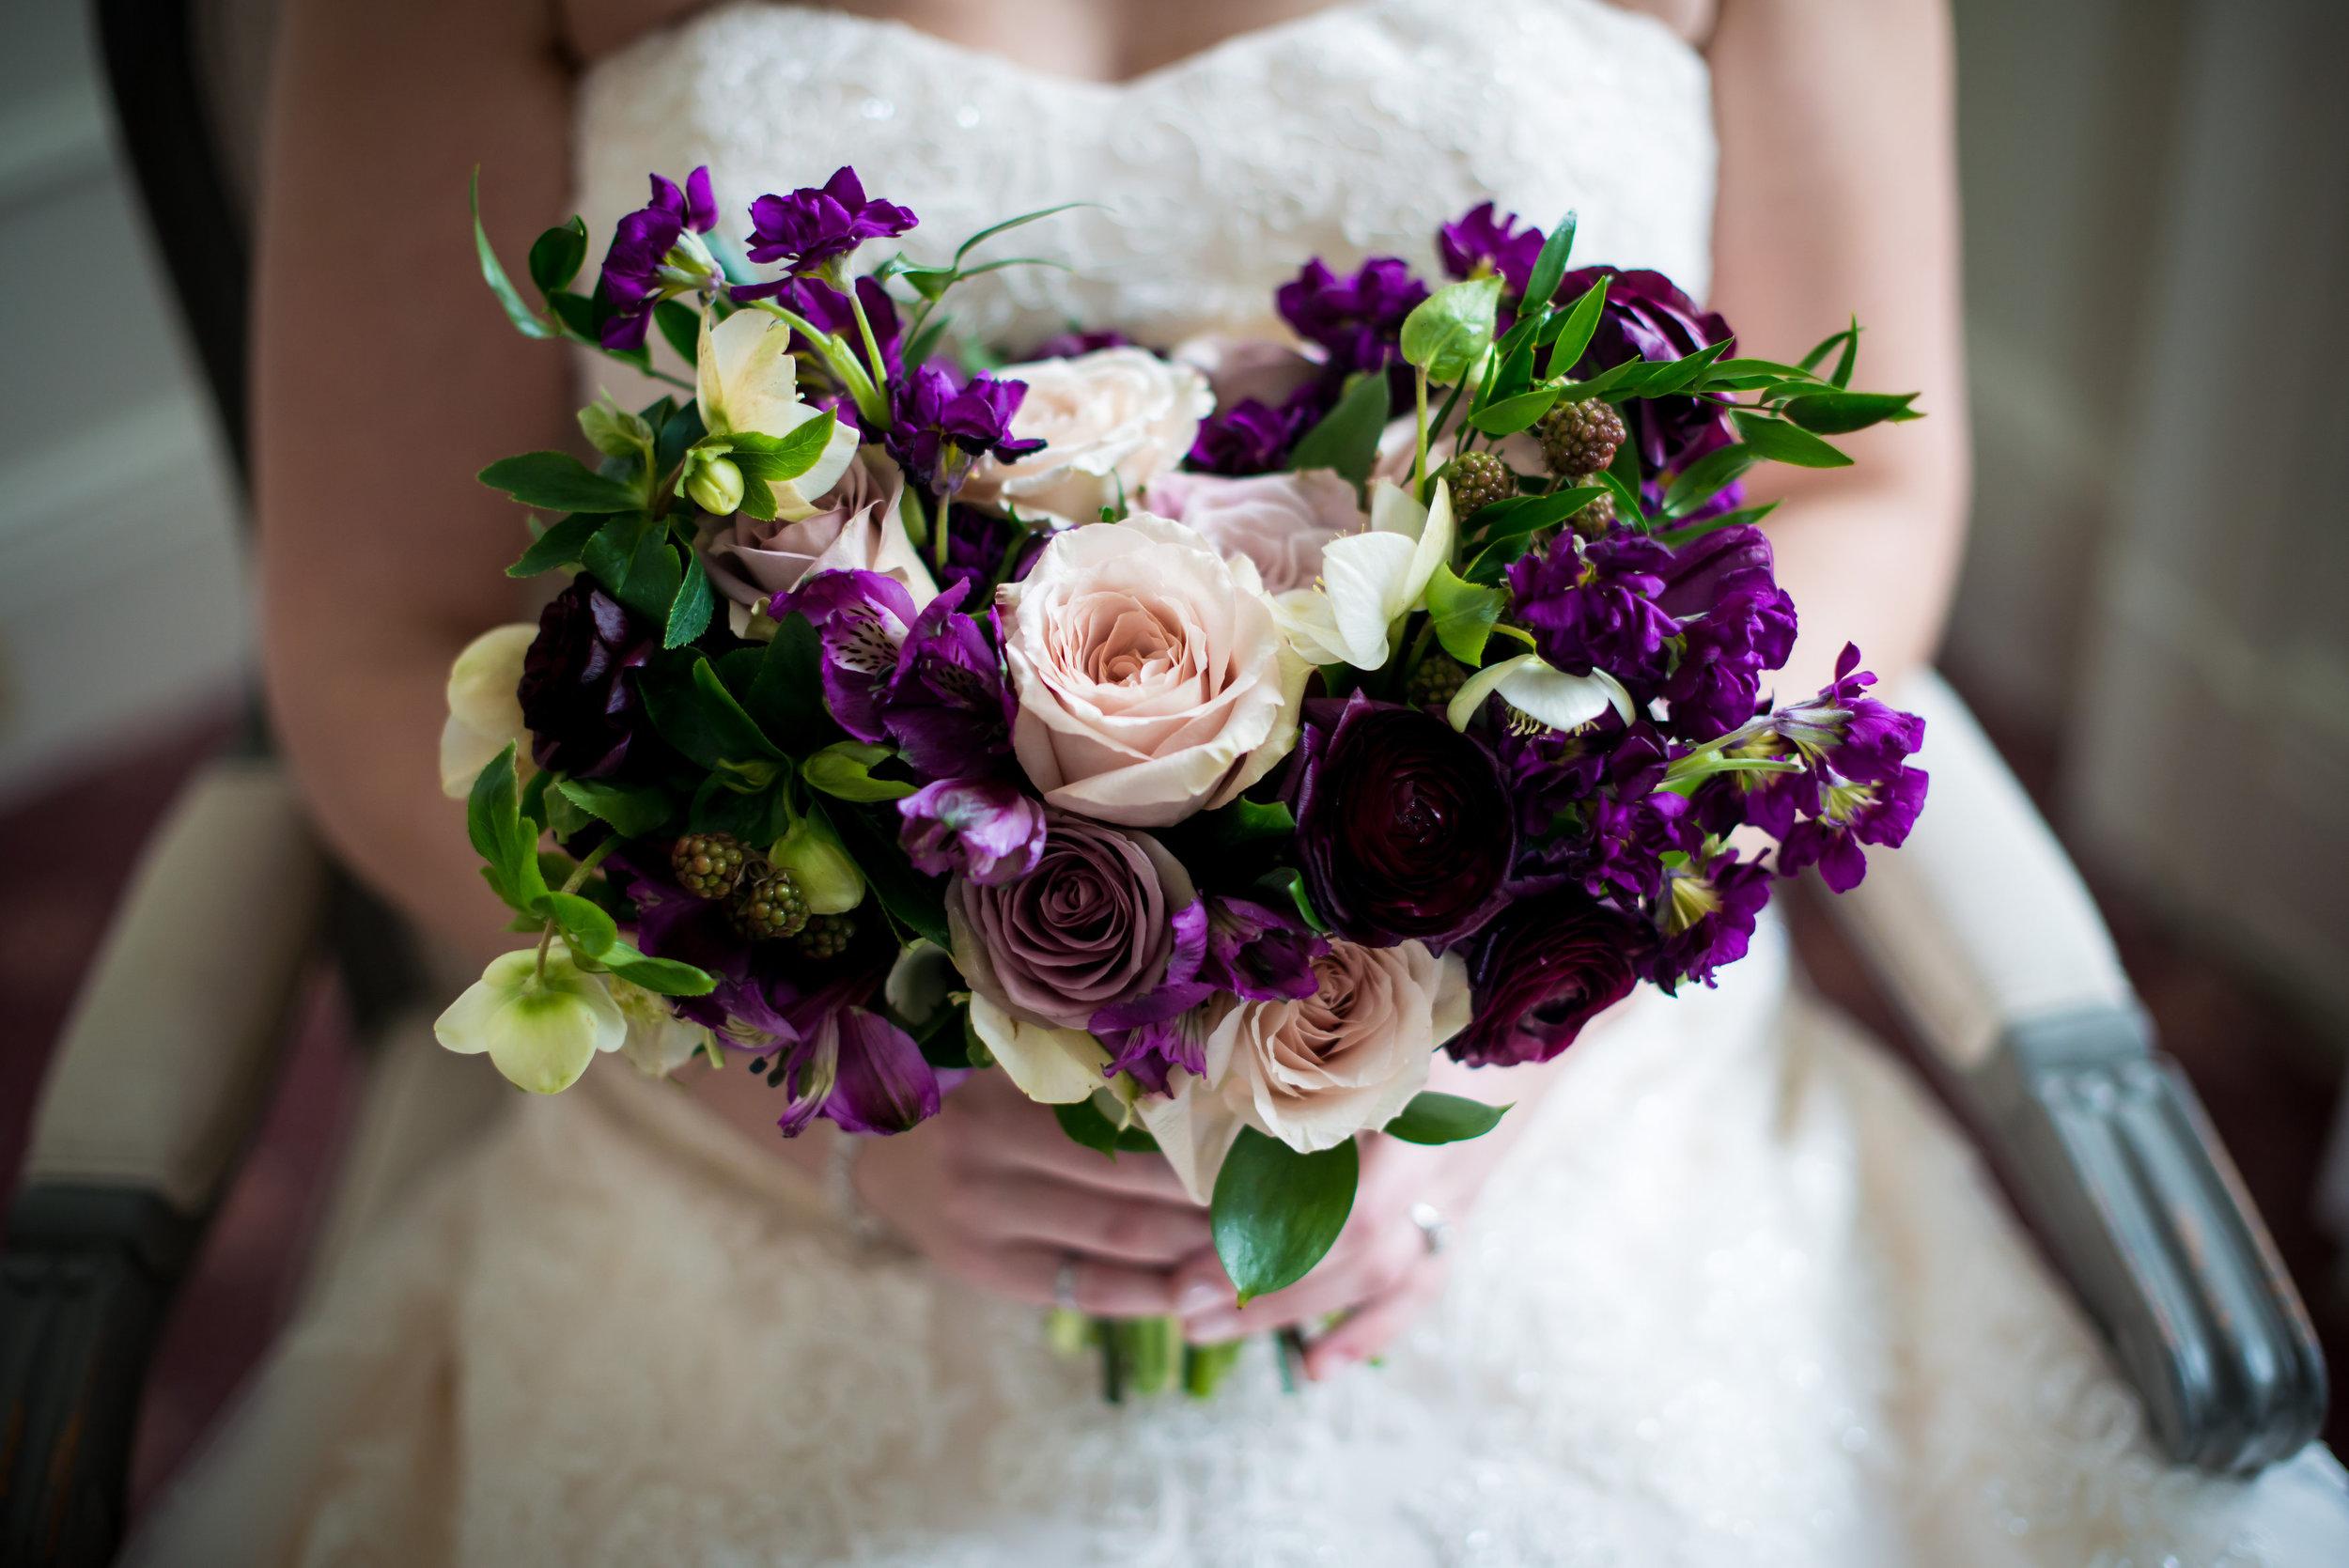 Plum and Blush Bridal Bouquet - Winnipeg Florist